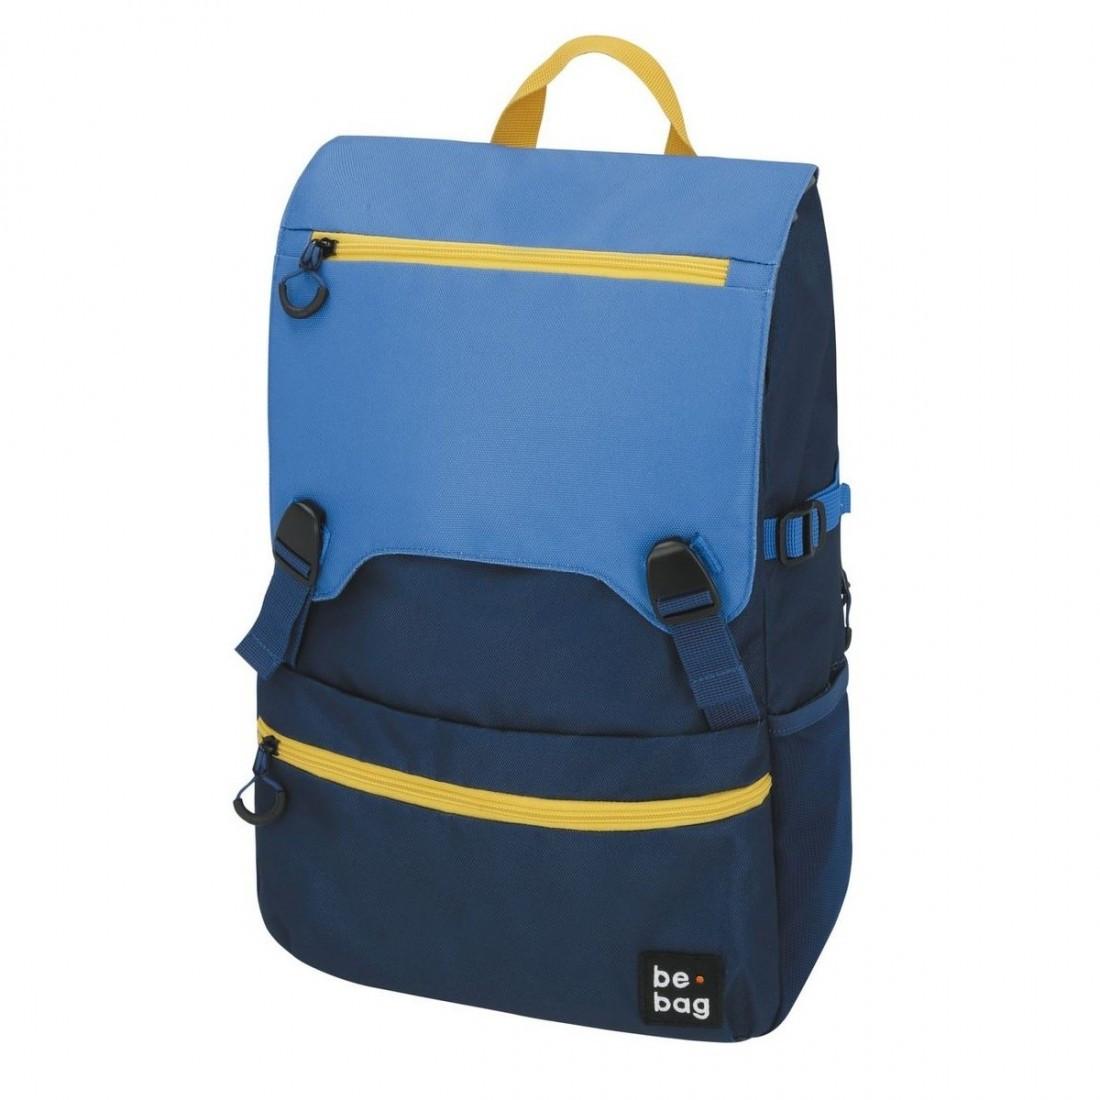 Рюкзак Herlitz be.bag be.smart Navy темно-синій